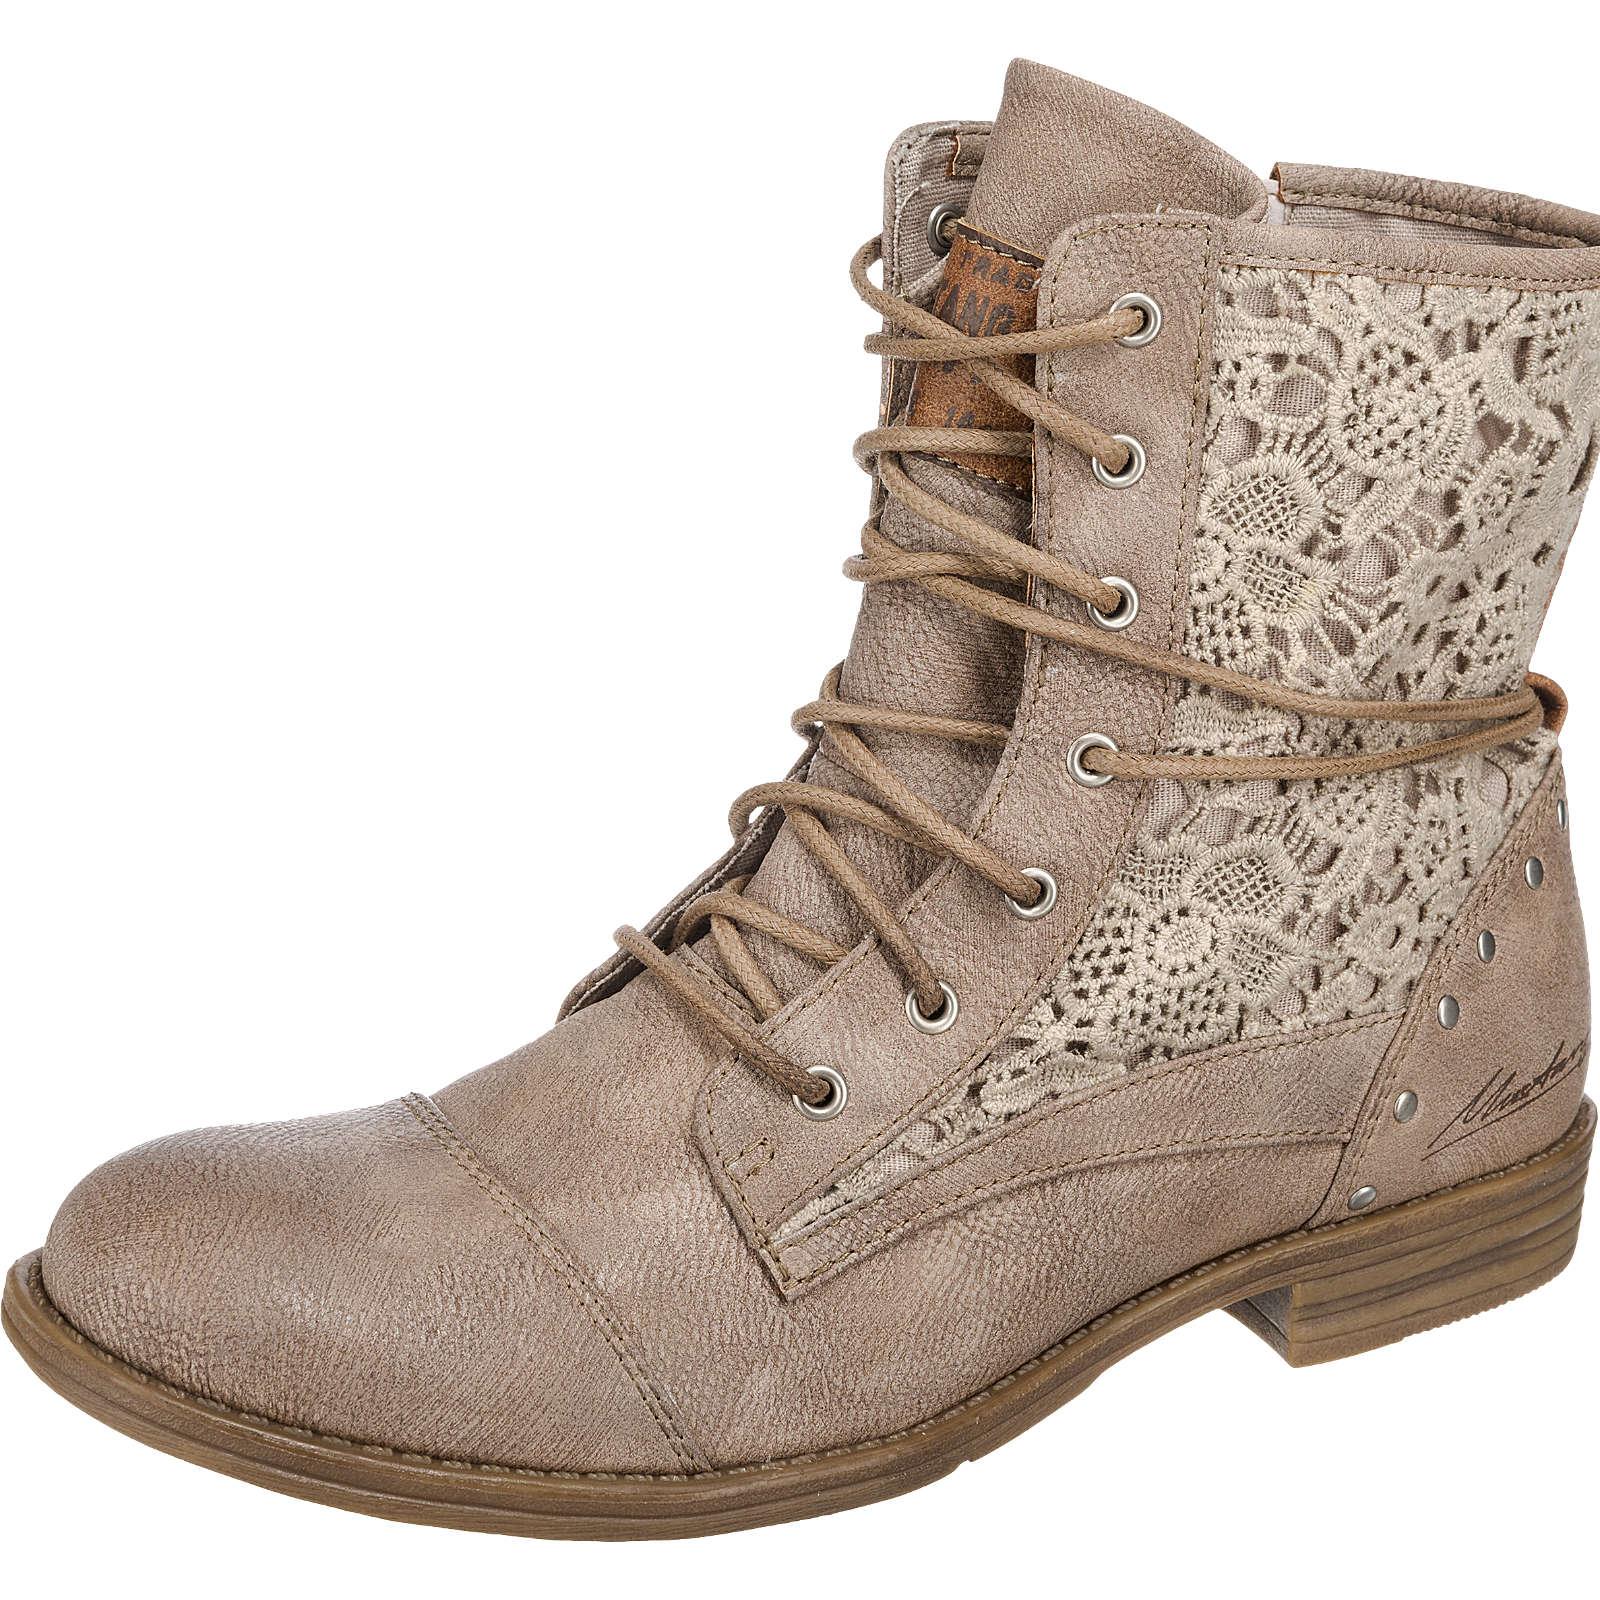 1235124155a40e Rabatt-Preisvergleich.de - Damen   Schuhe   Stiefel für Damen ...